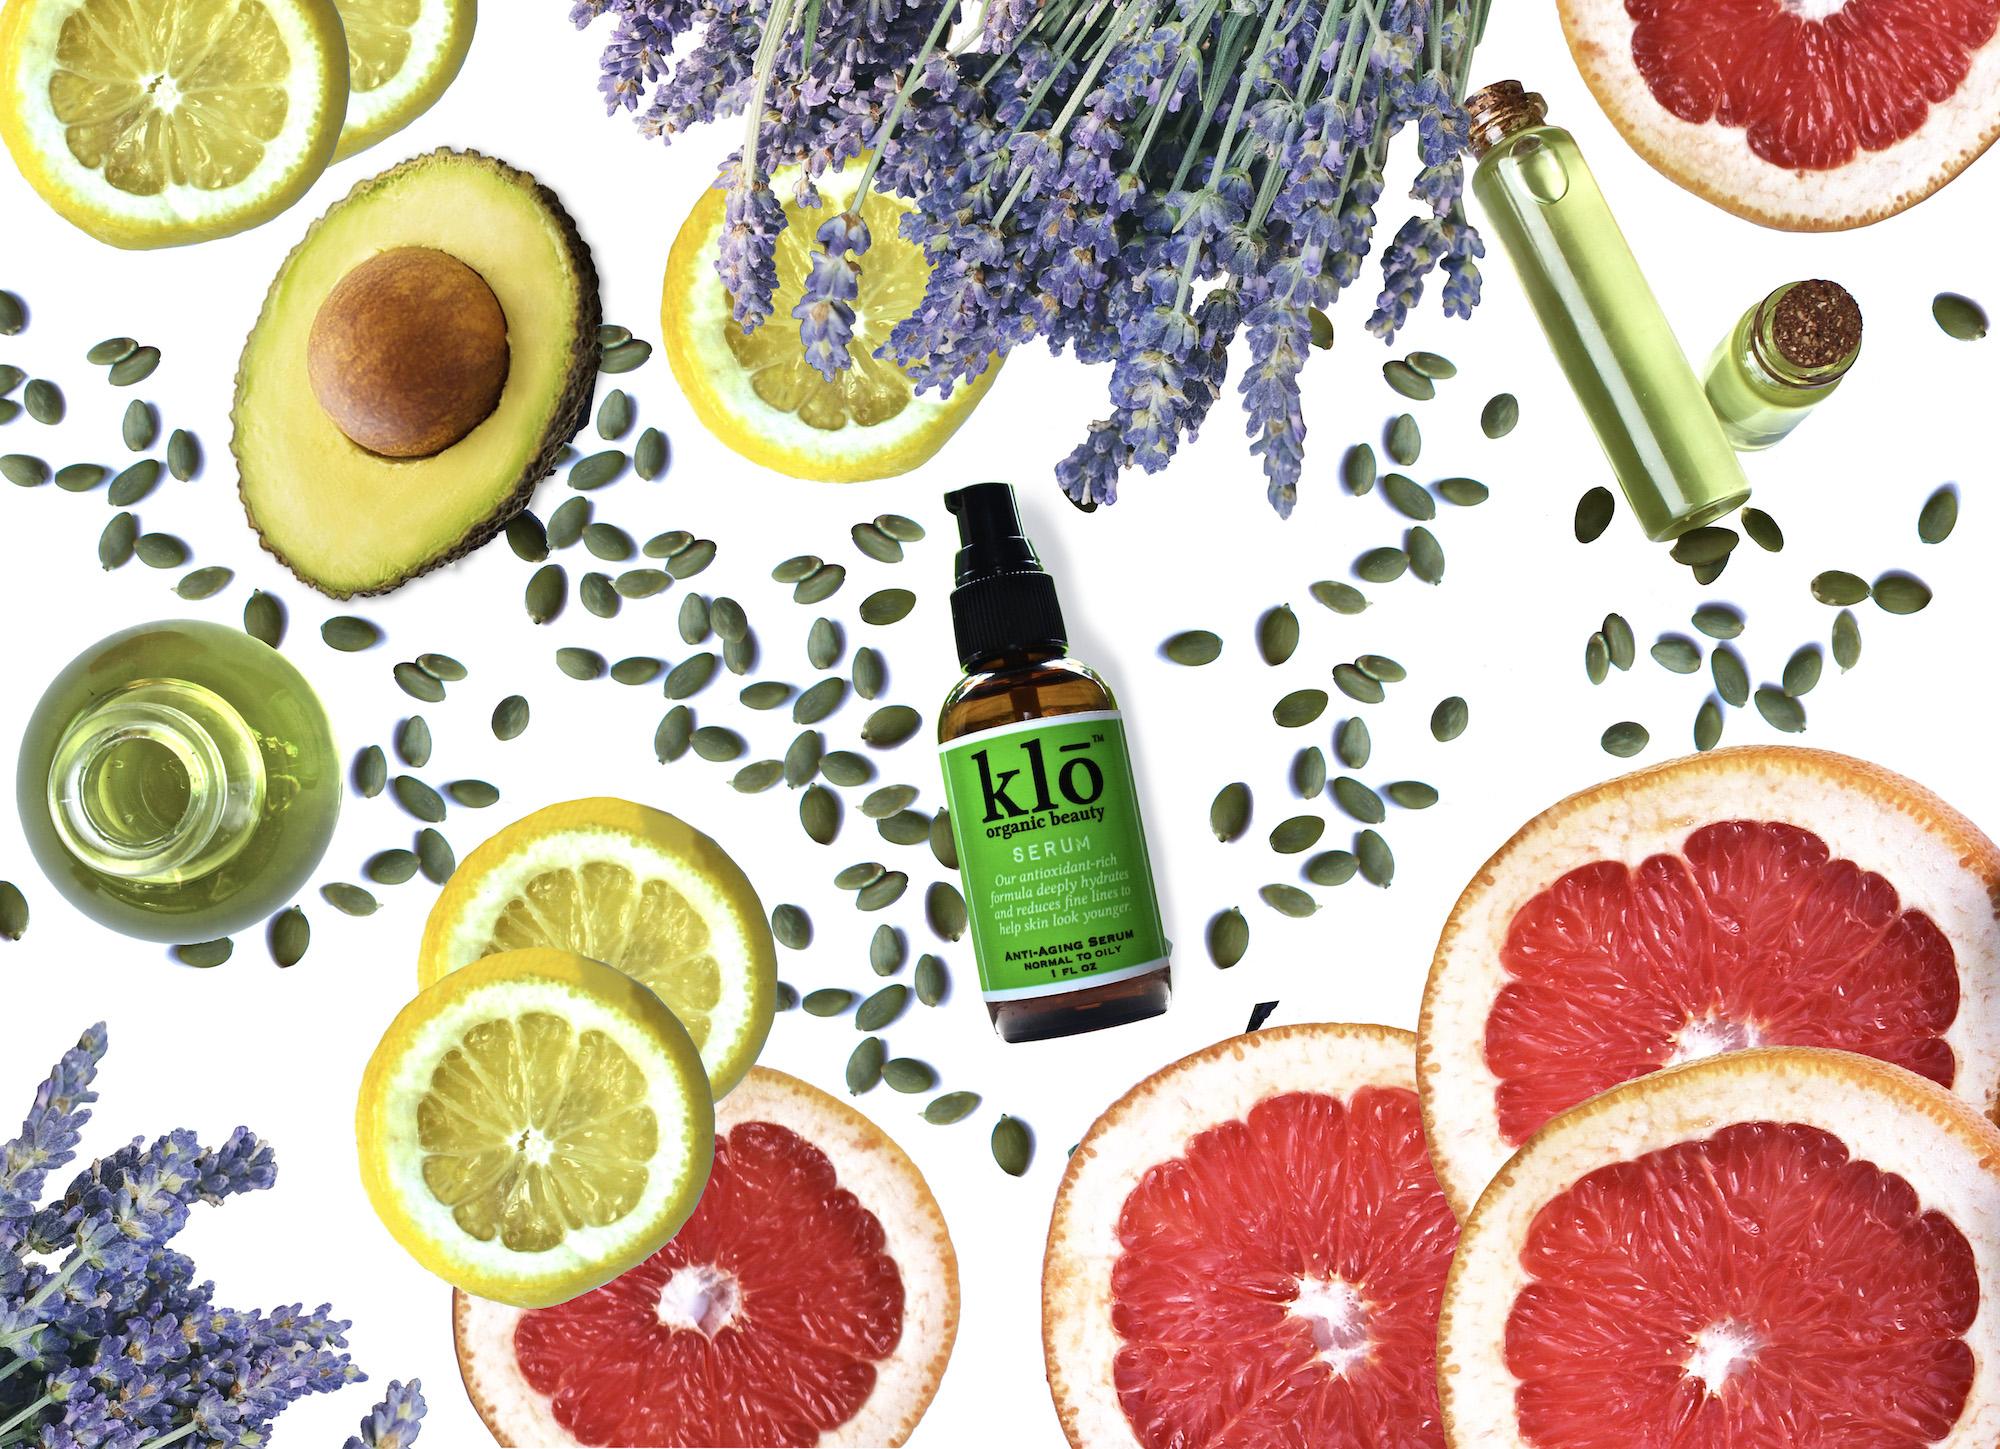 Klō Organic Beauty serum with cut citrus, avocado and lavender